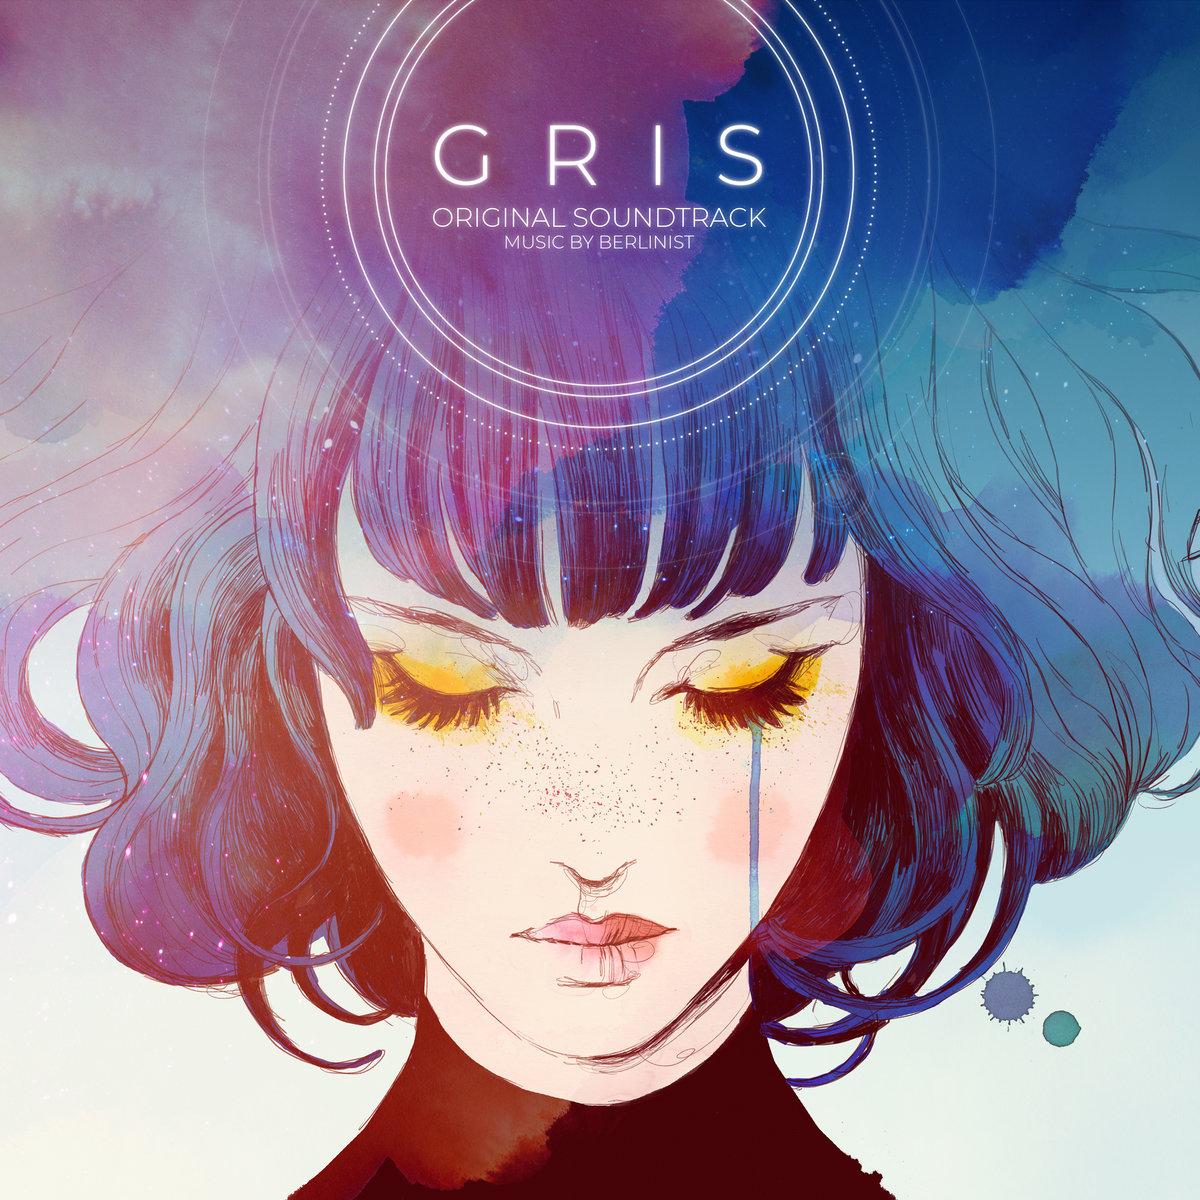 Gris (Original Soundtrack) | Berlinist